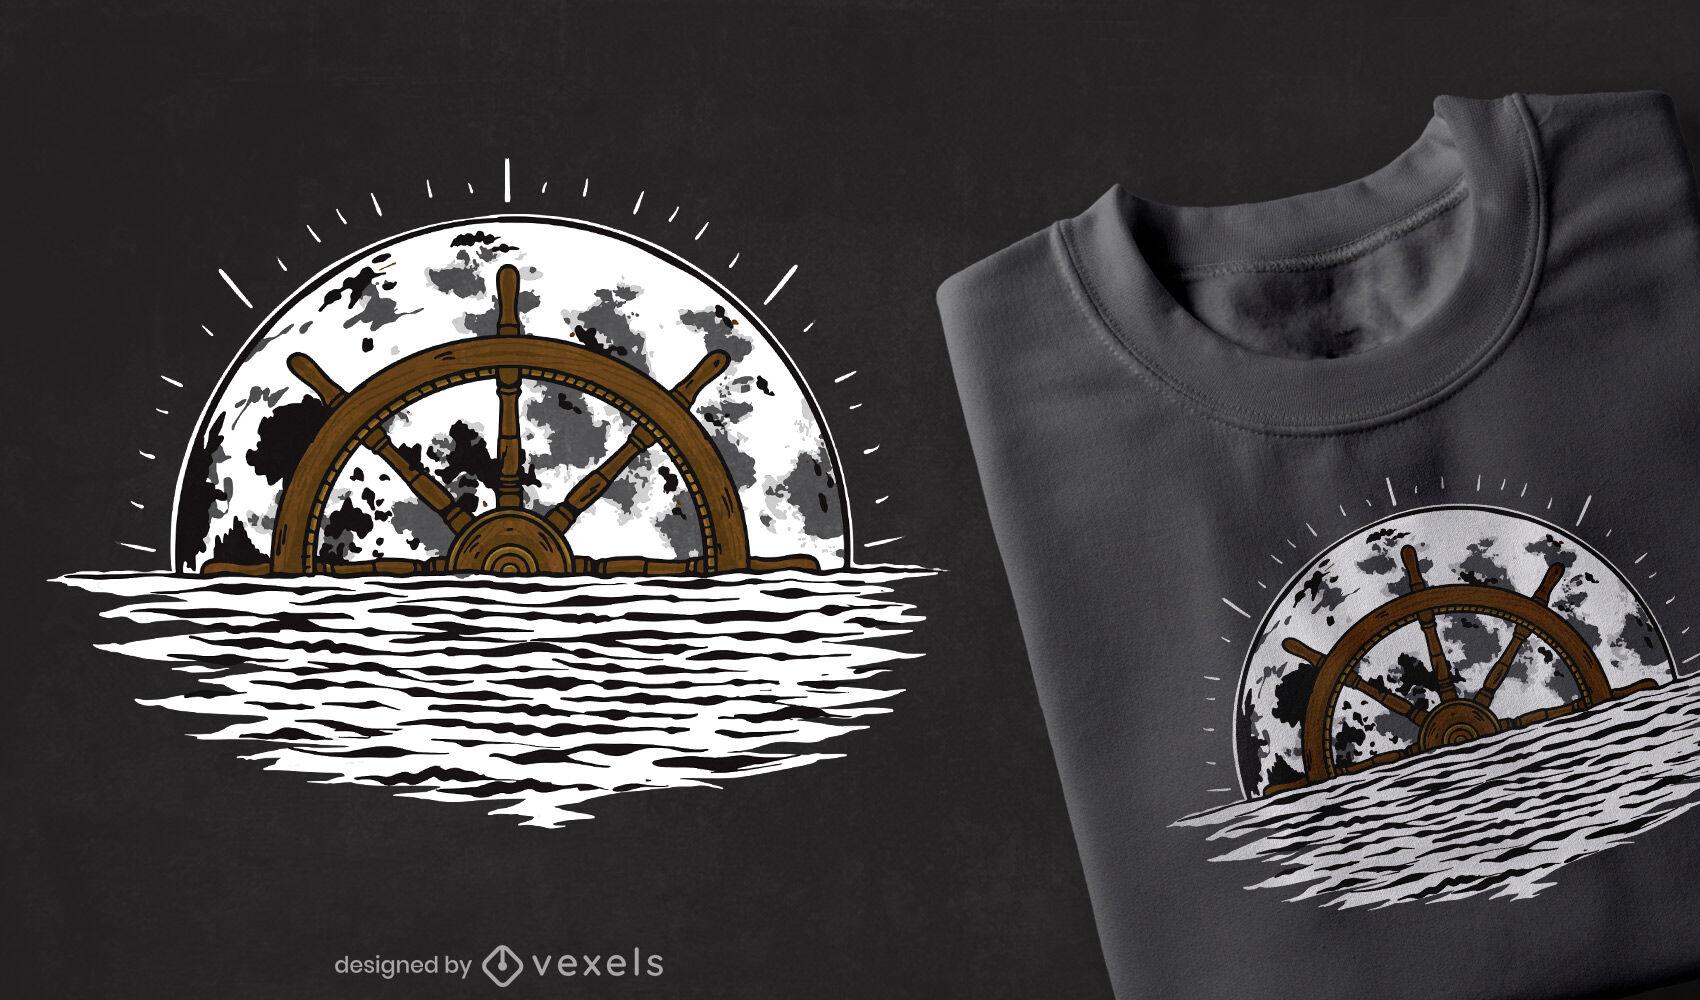 Moon ship steering wheel t-shirt design